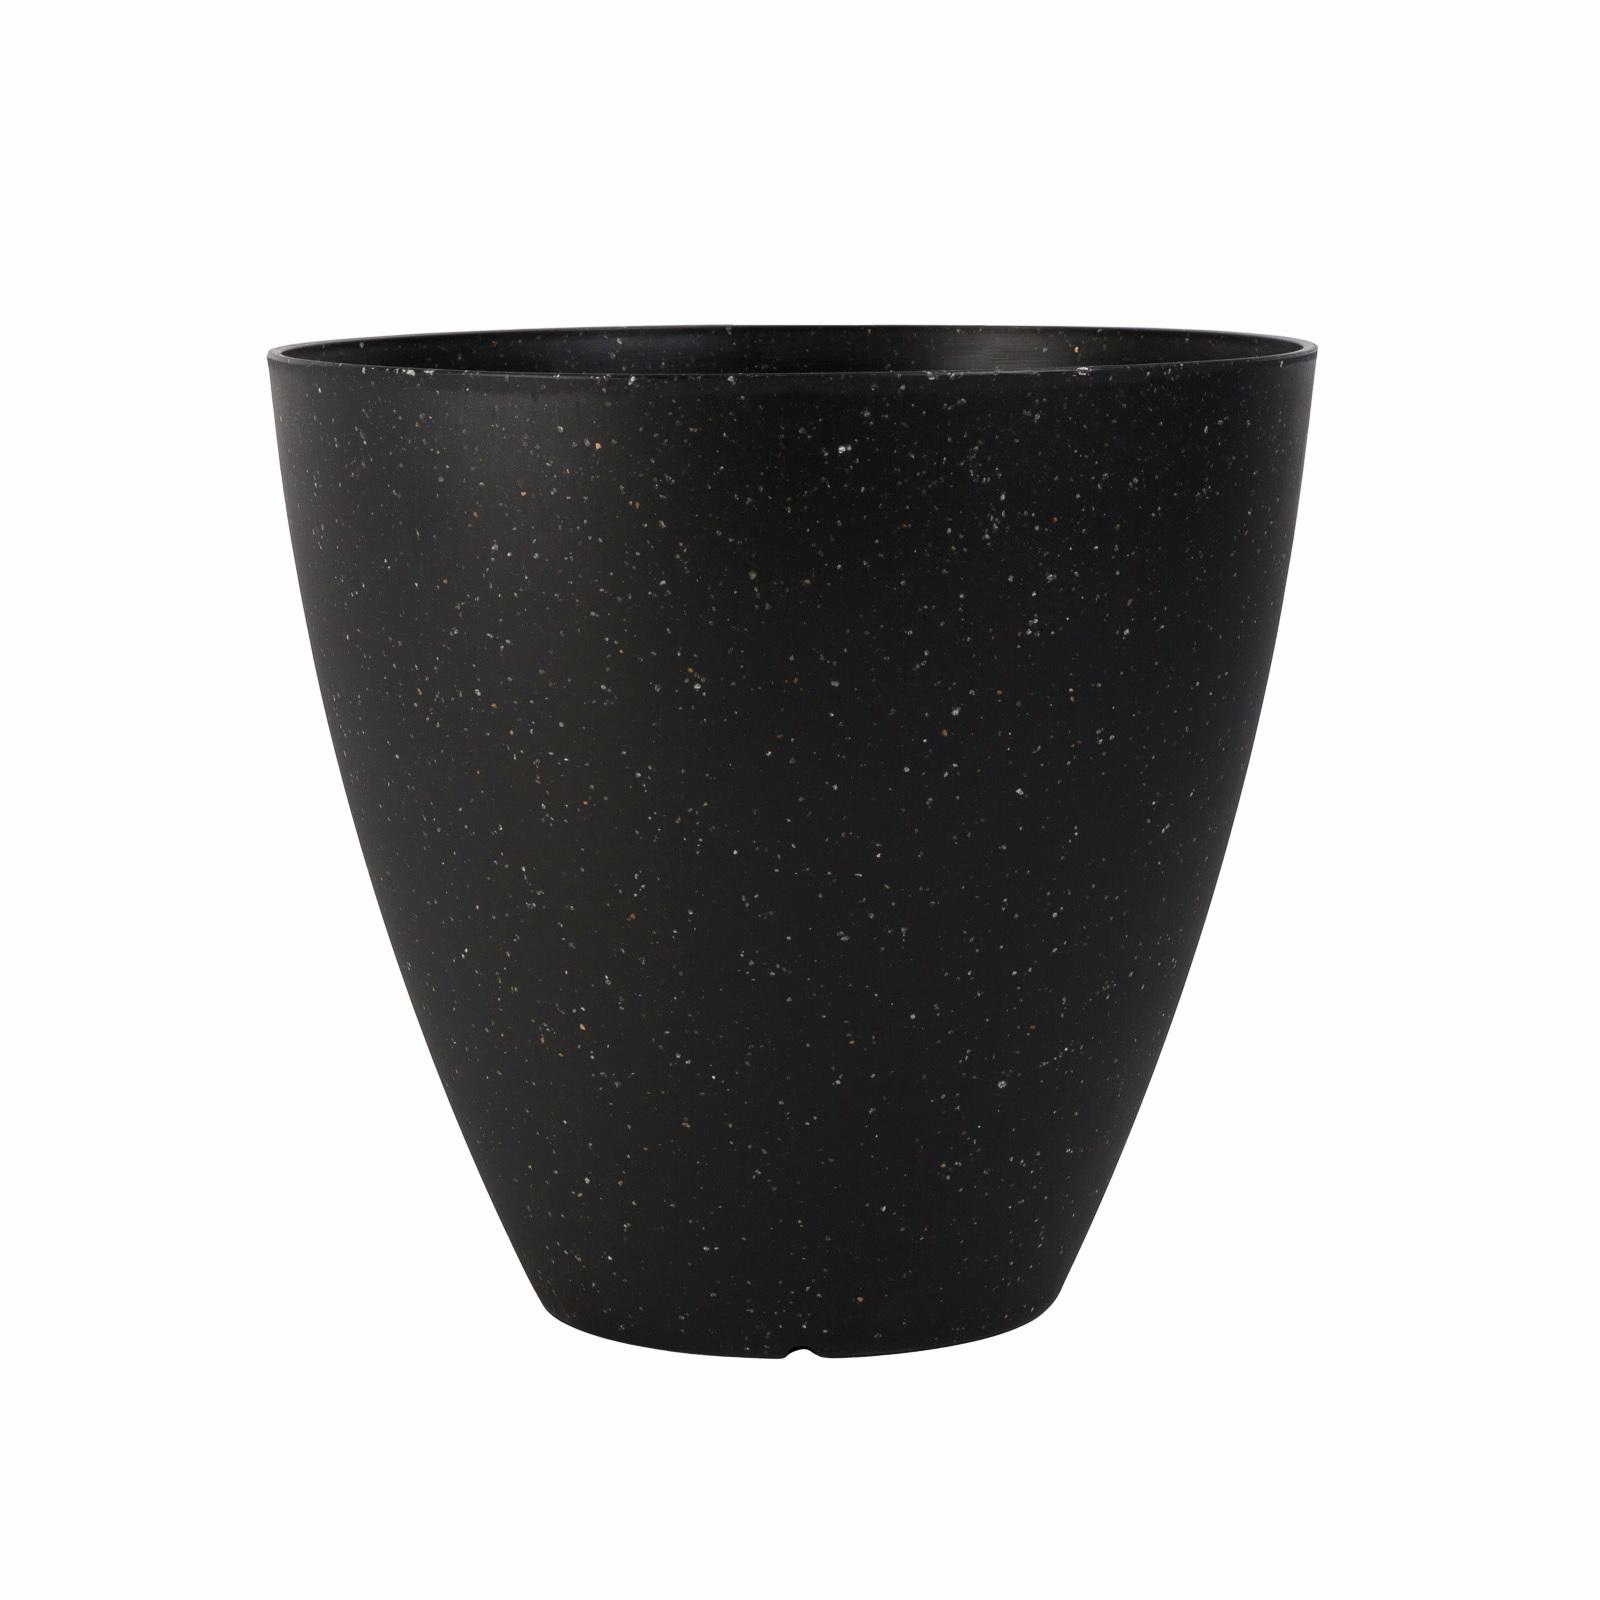 Northcote Pottery 30cm Black Terrazzo Self Watering Pot